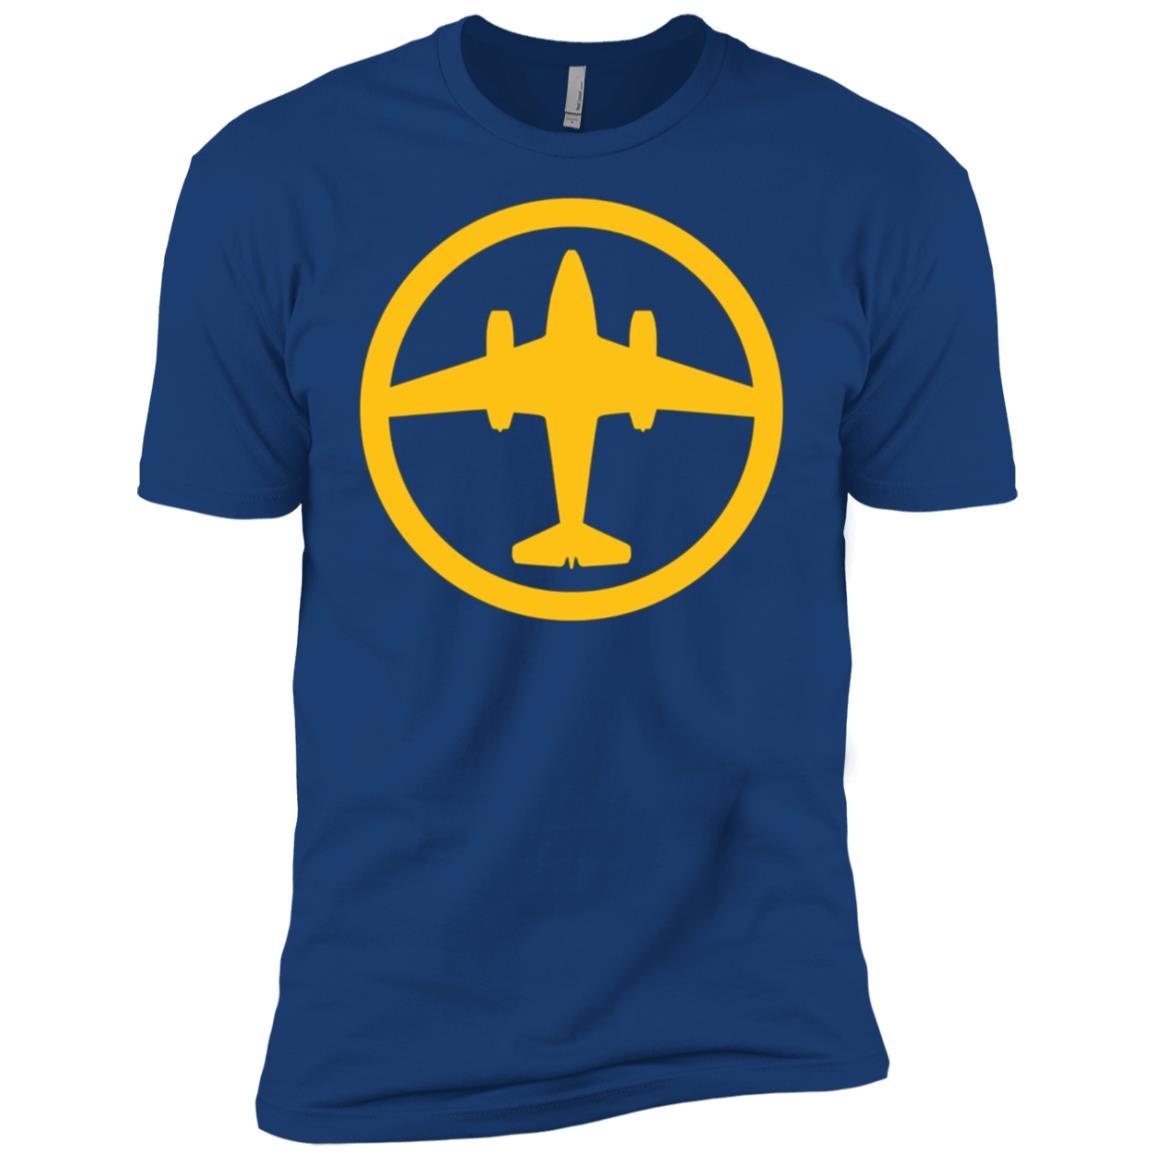 Me 262 Schwalbe (Yellow) World War II Airplane Men Short Sleeve T-Shirt